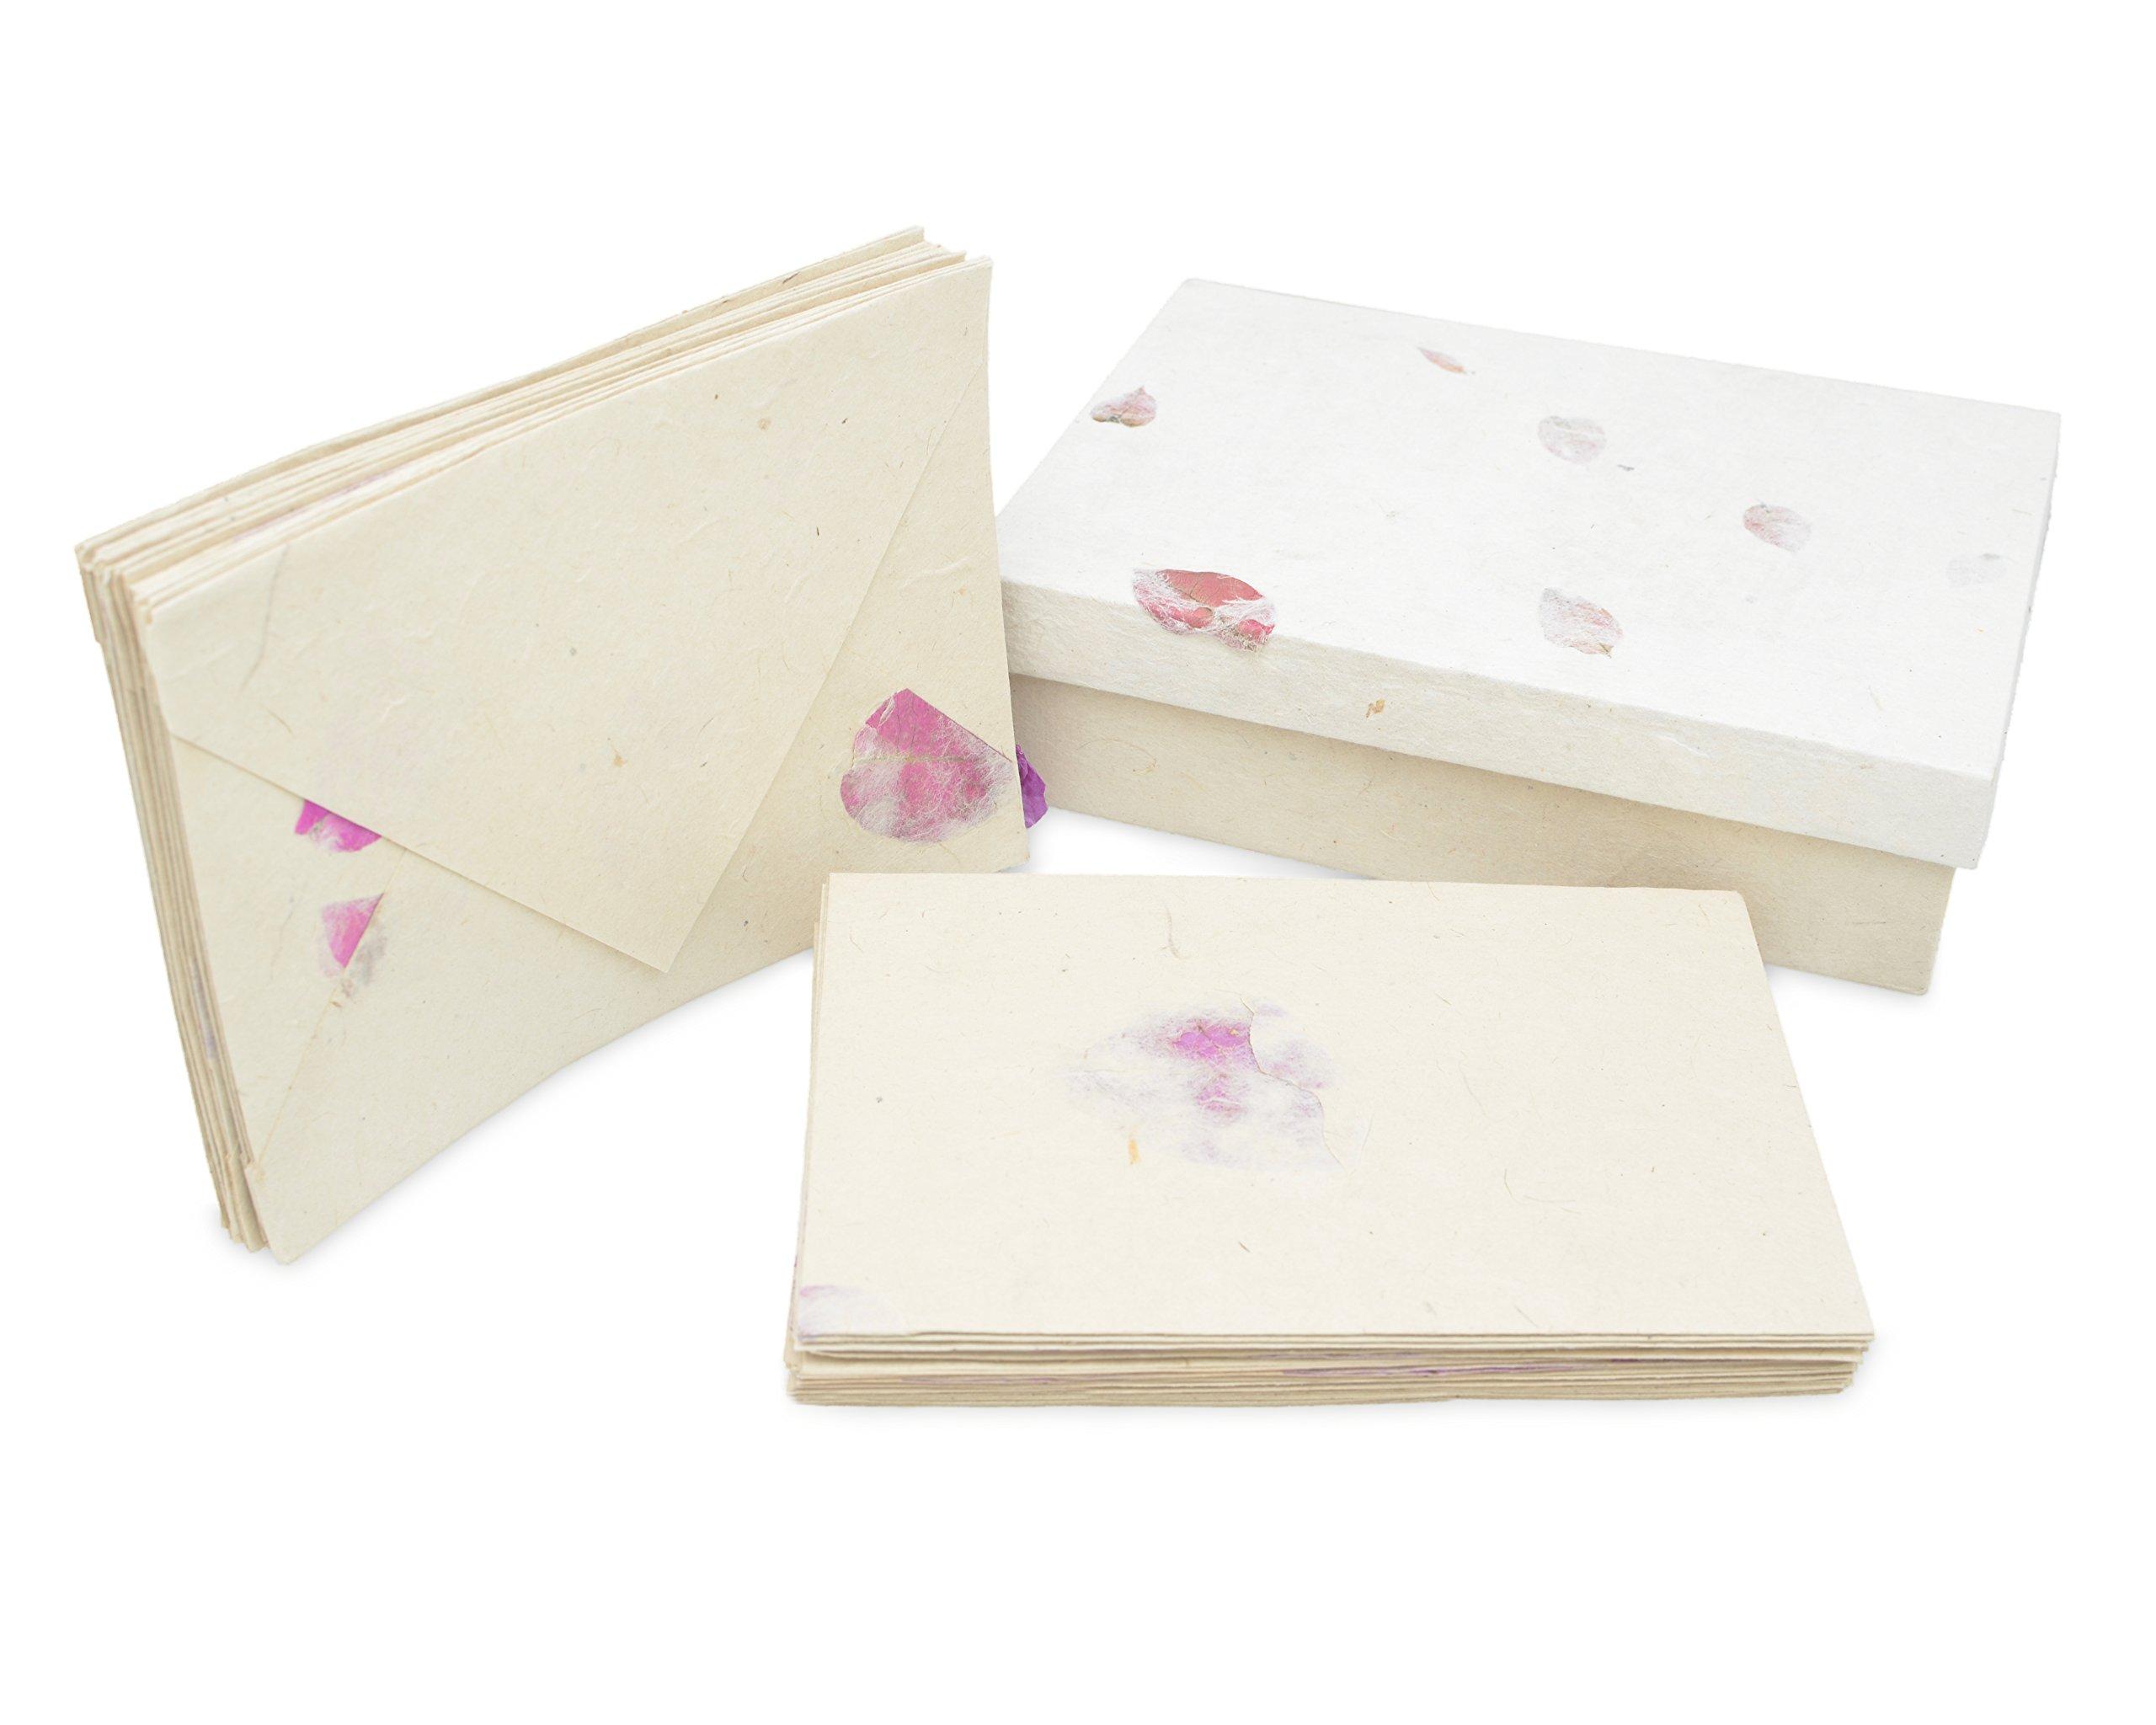 Nepali Cherish Greeting Card & Envelope Box Set with Handmade Lokta Paper from Nepal, 15 Cards (Bougainvillea)